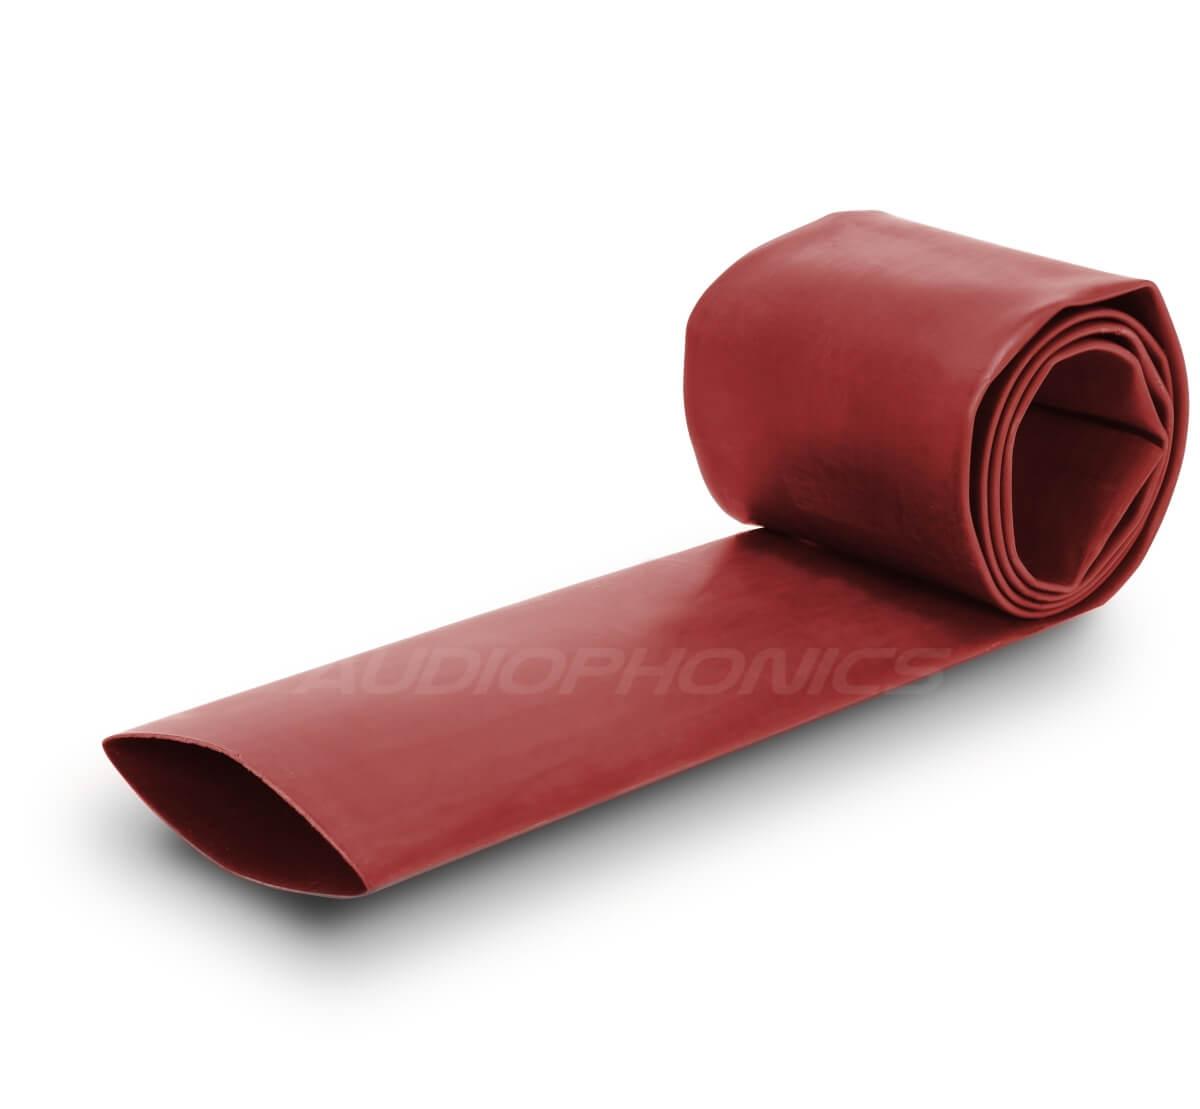 Heatshrink tube 2:1 Ø3mm Length 1m Red